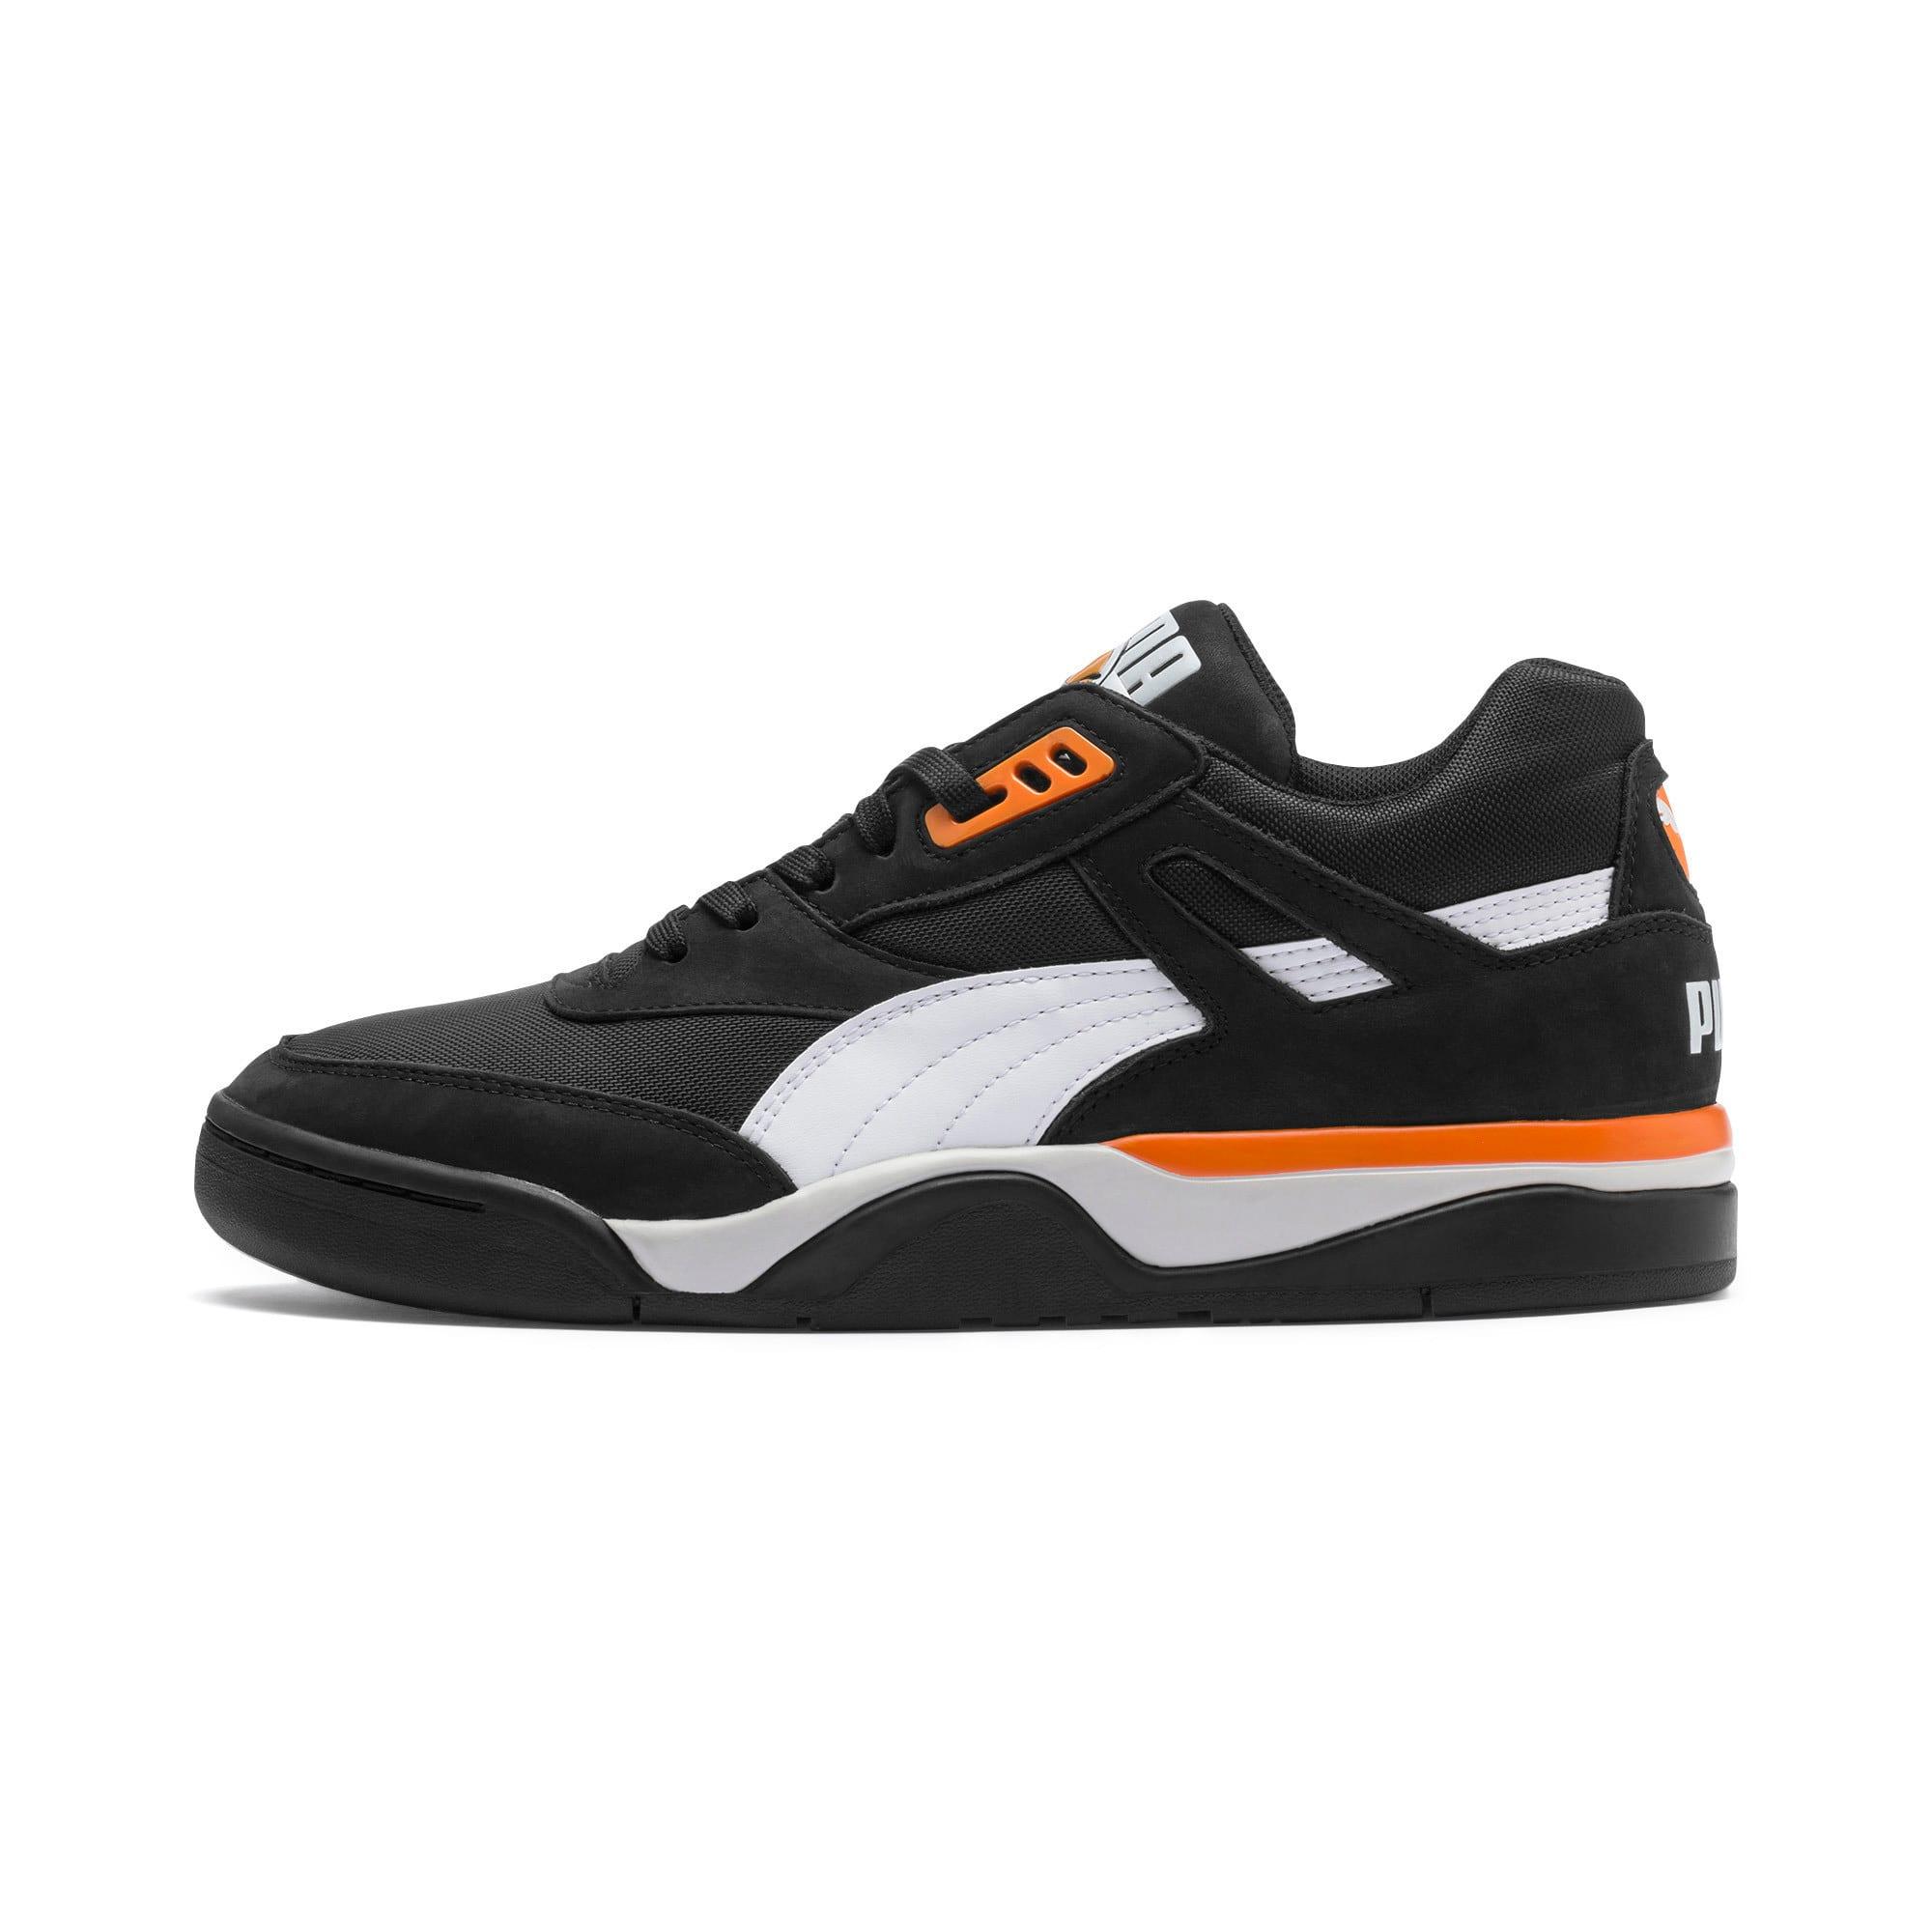 Thumbnail 1 of Palace Guard BB Sneakers, Puma Black-Puma White-, medium